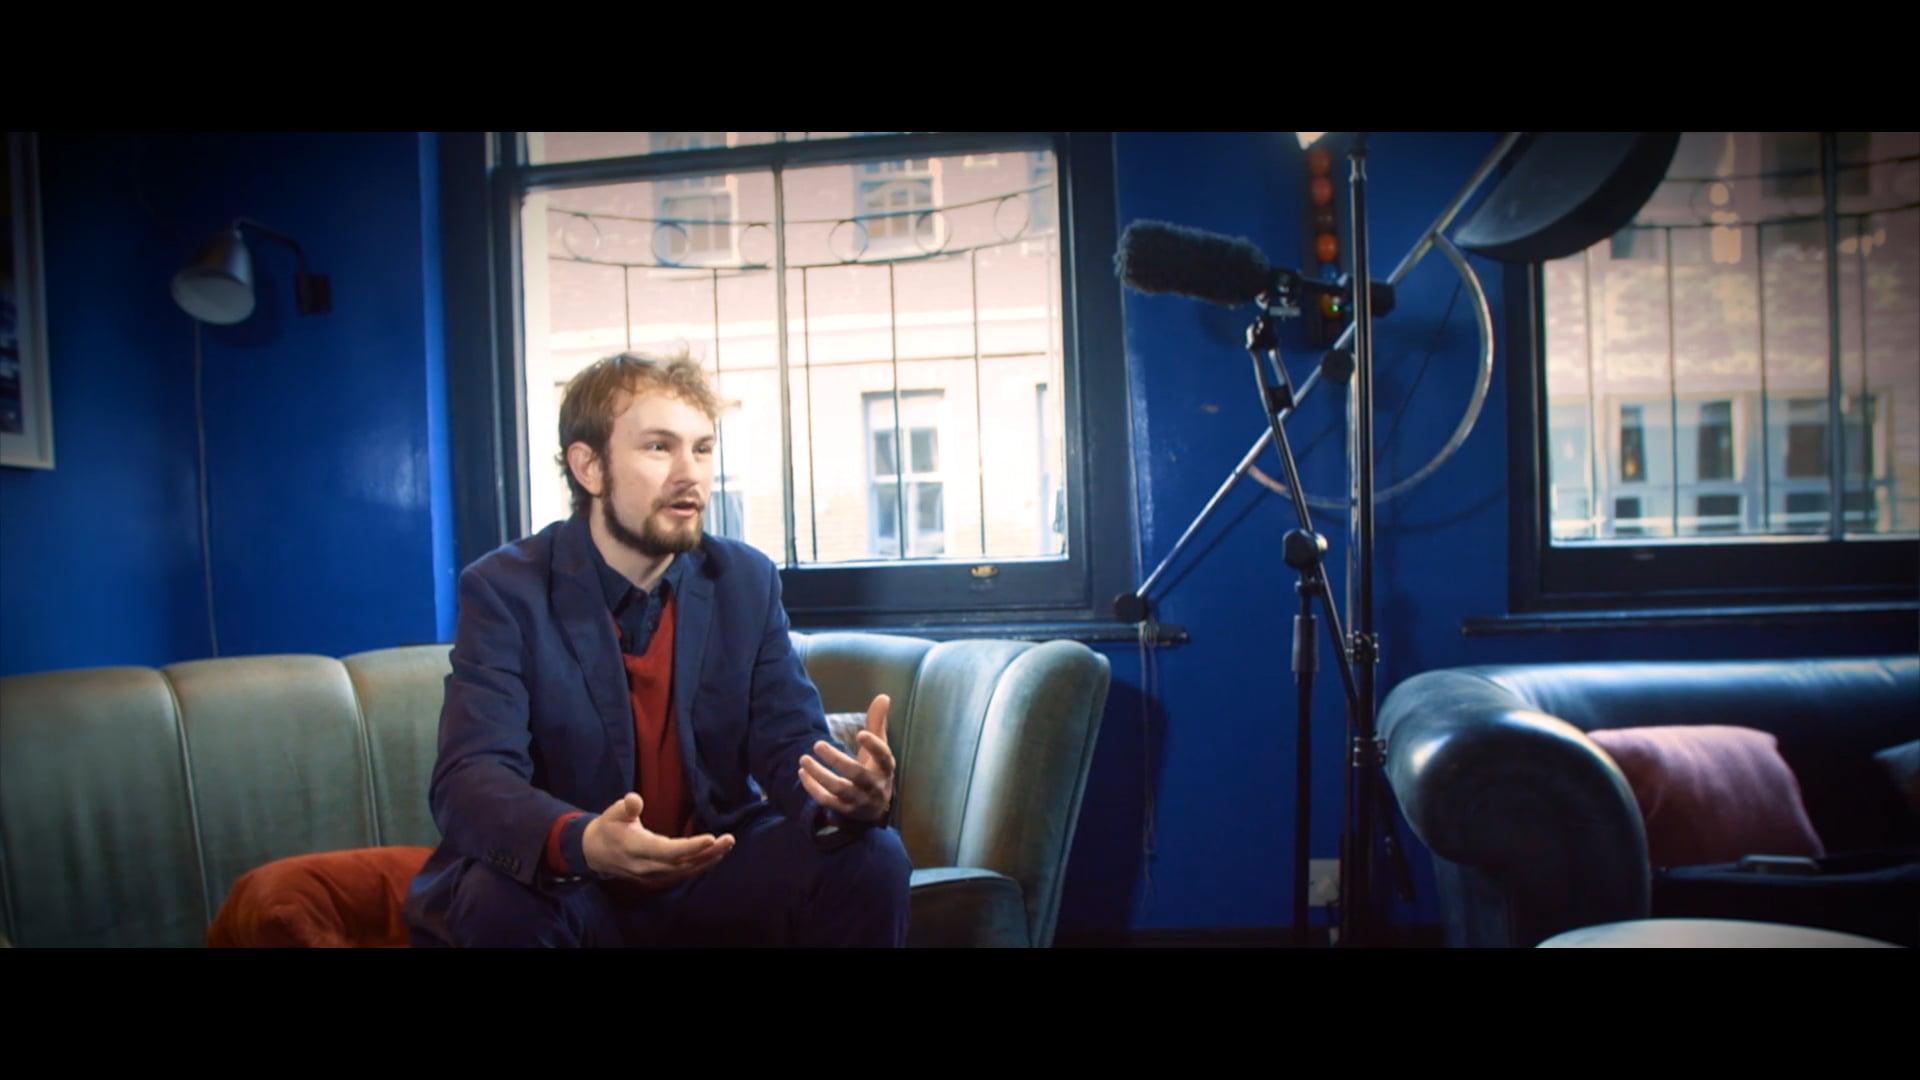 Nicholas Hulbert - Director